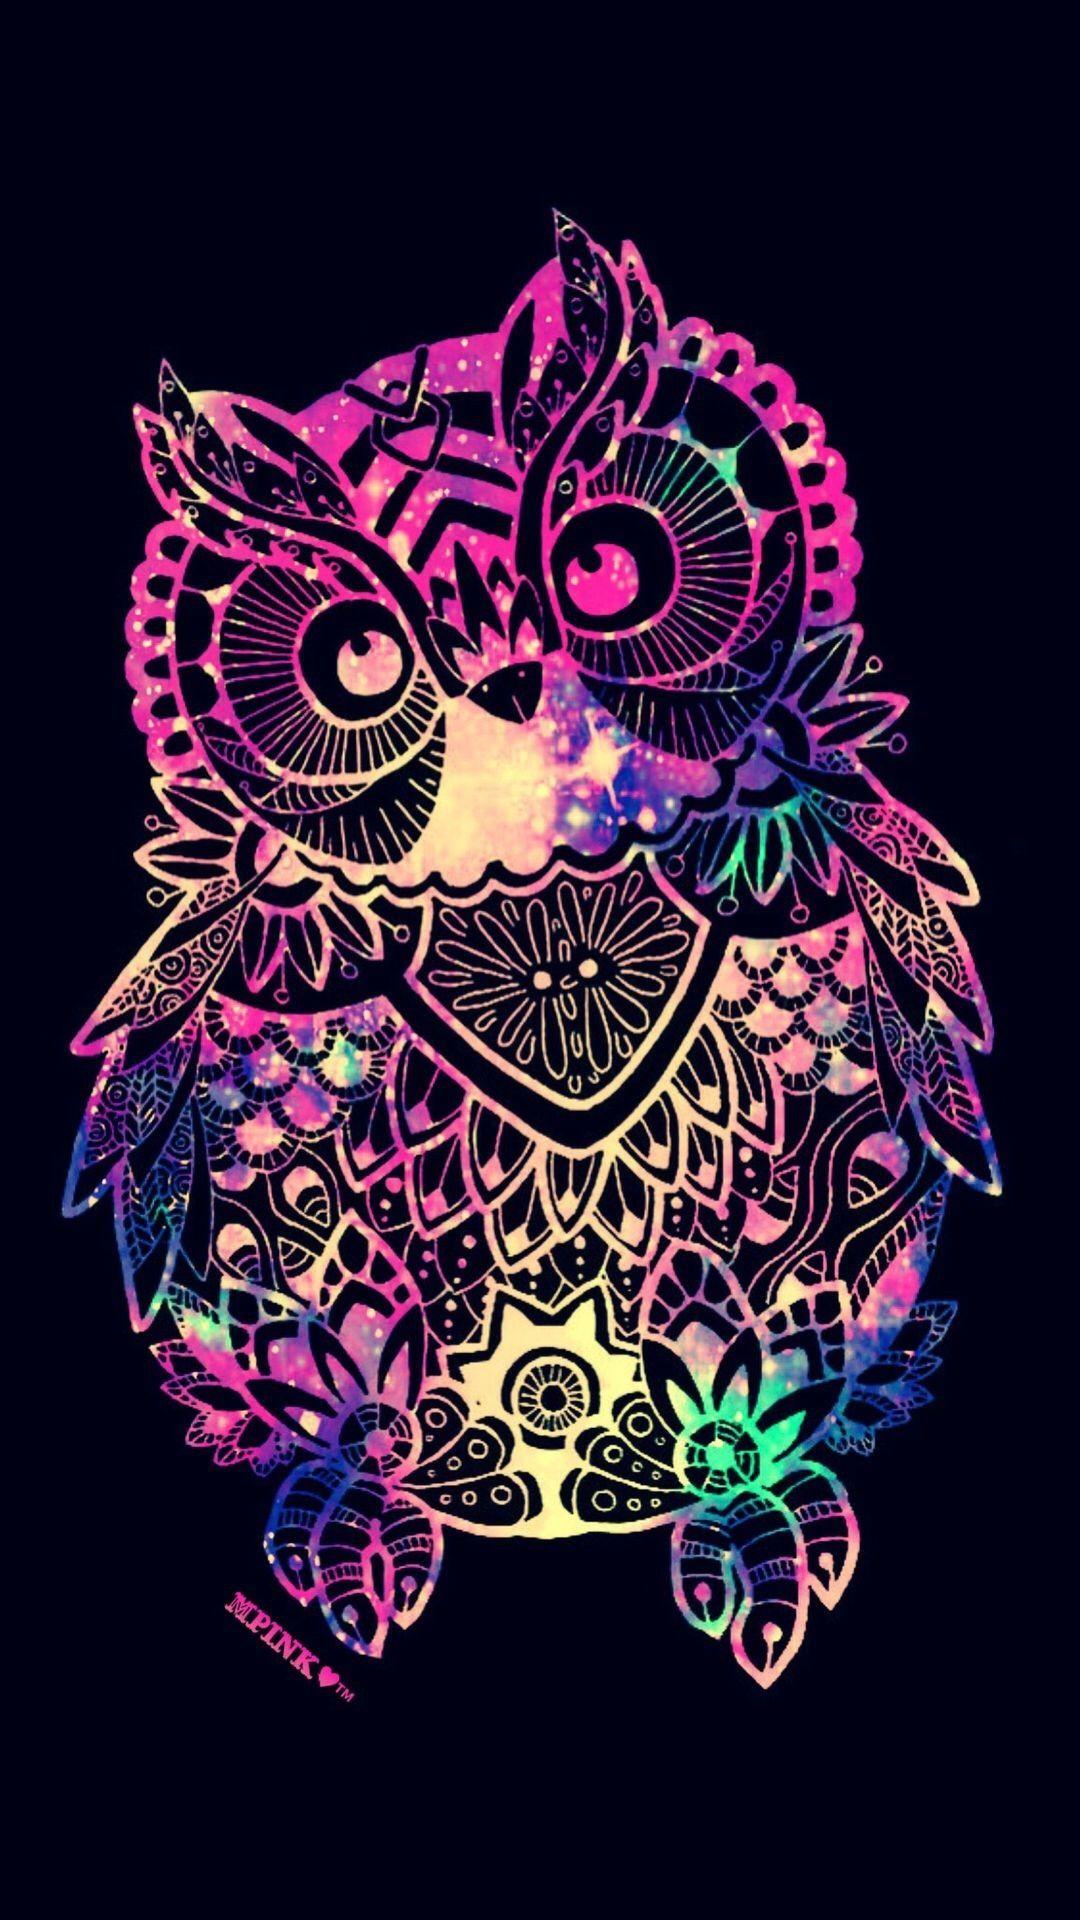 Cute Owl Phone Wallpaper Wallpaper Iphone Neon Iphone Wallpaper Owl Wallpaper